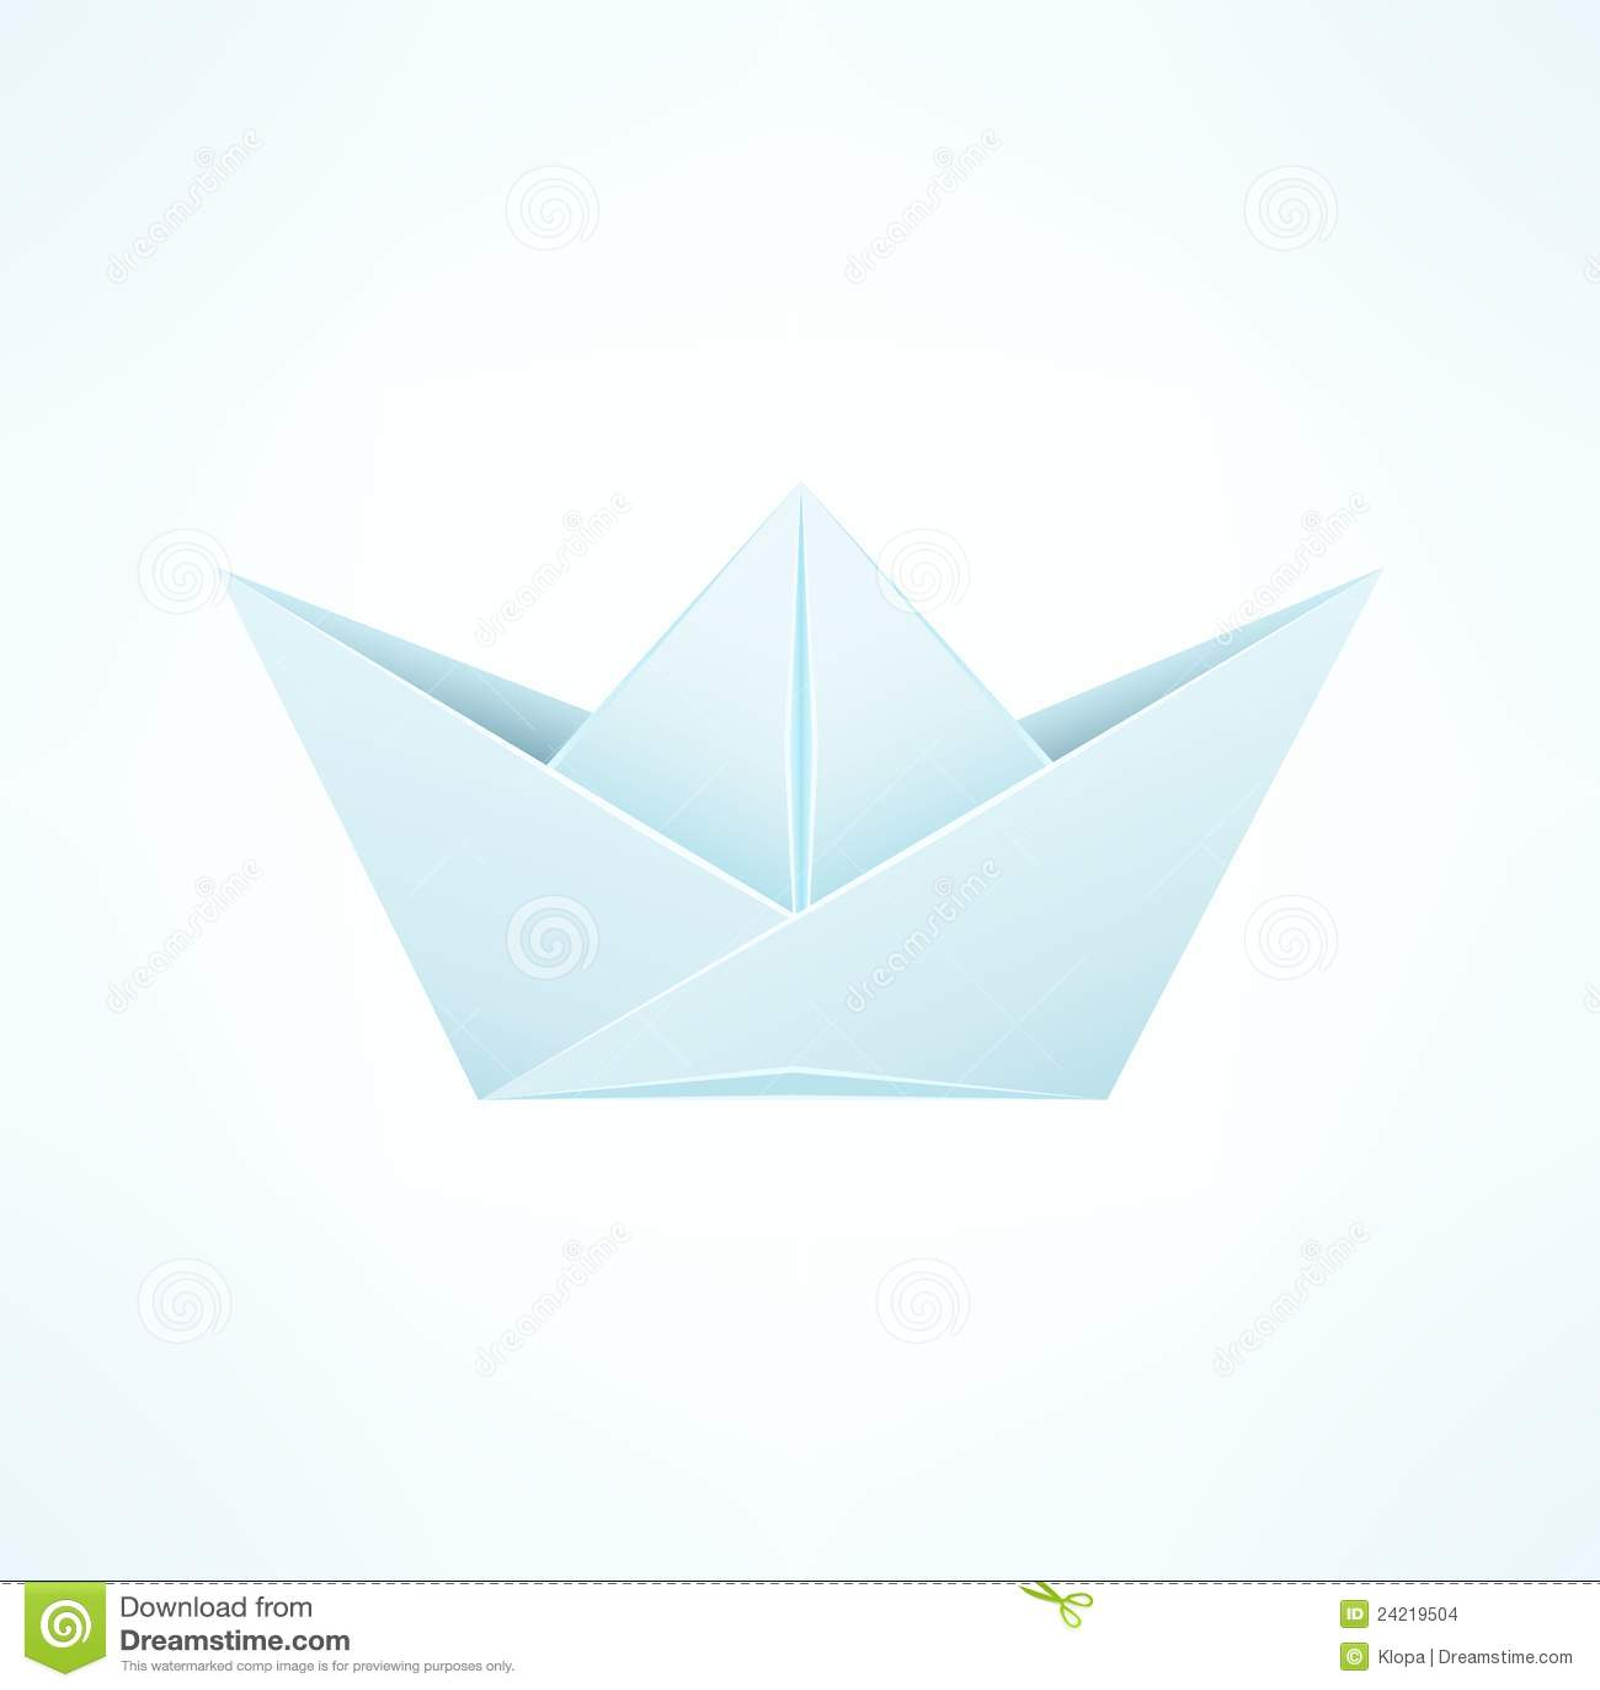 Paper Ship Origami Isolated on White Blue Background. Illustration.